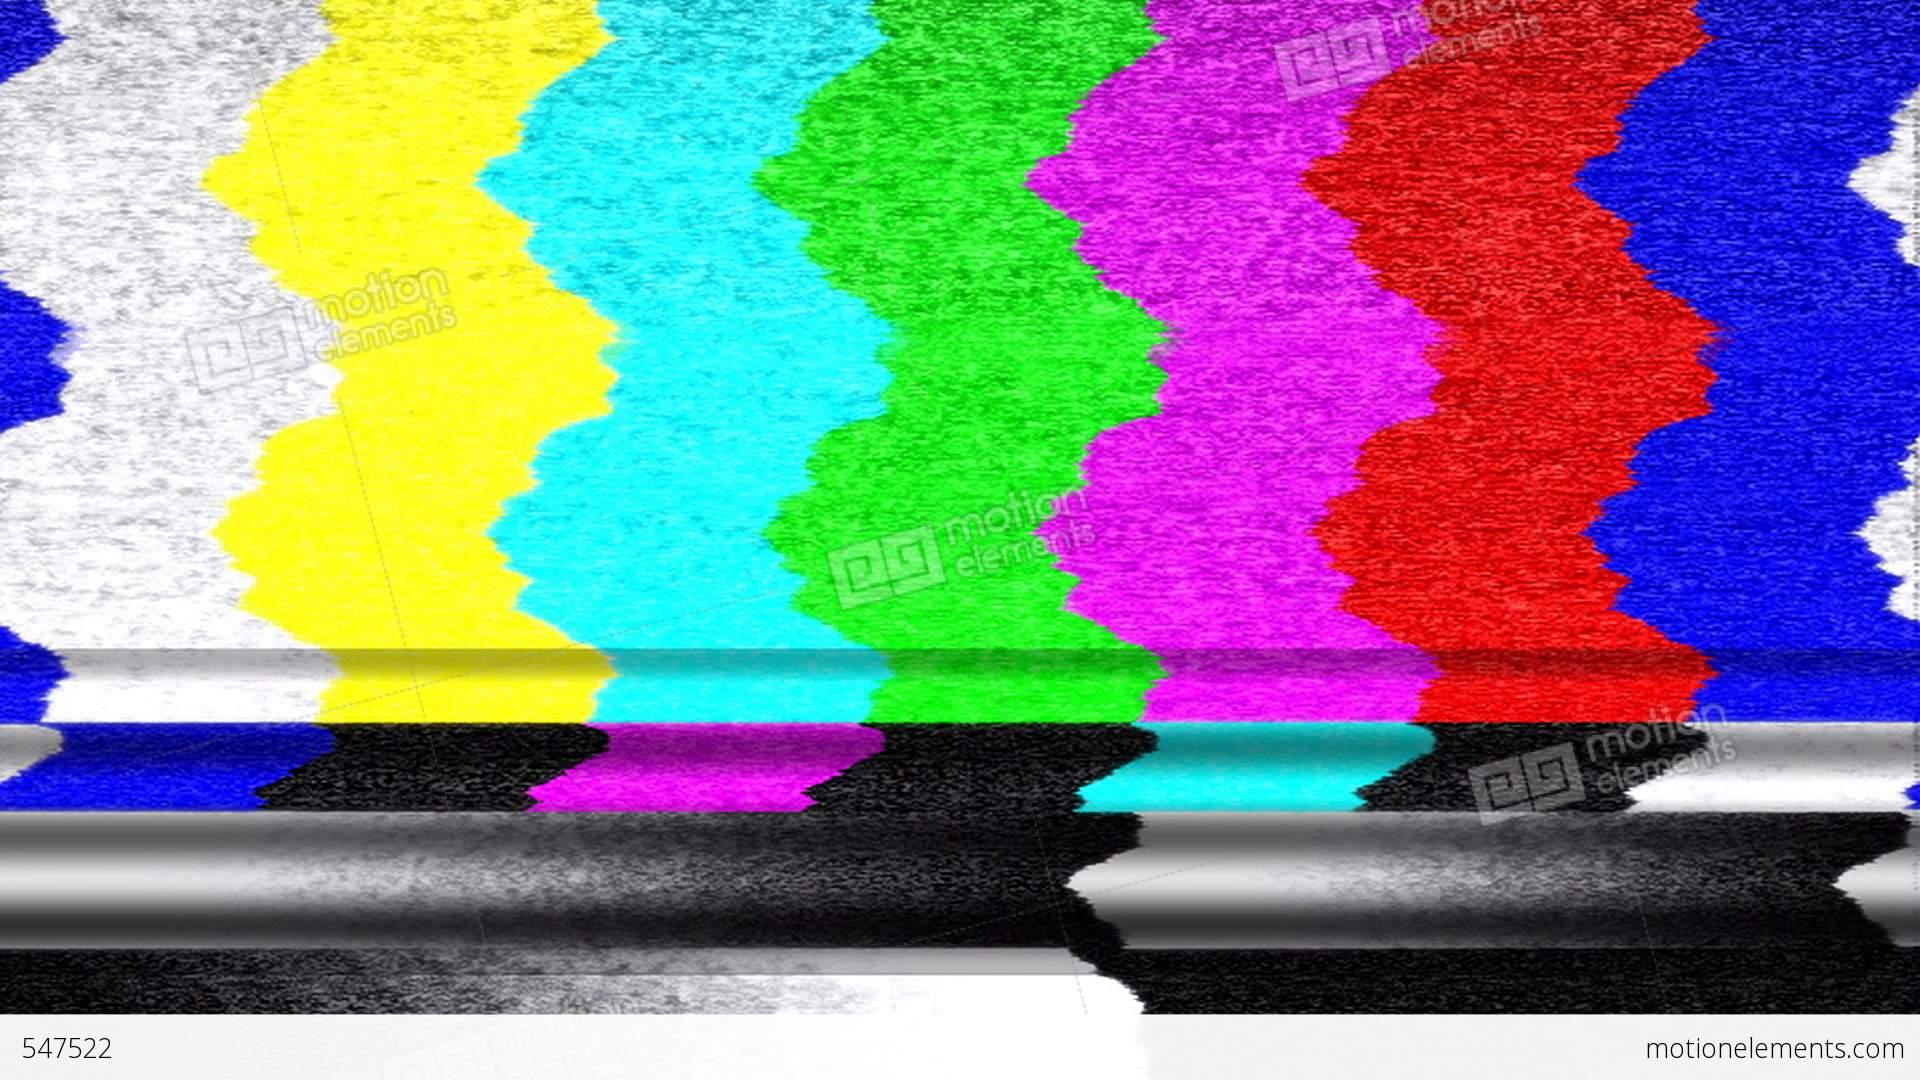 Television Noise - Television Noise